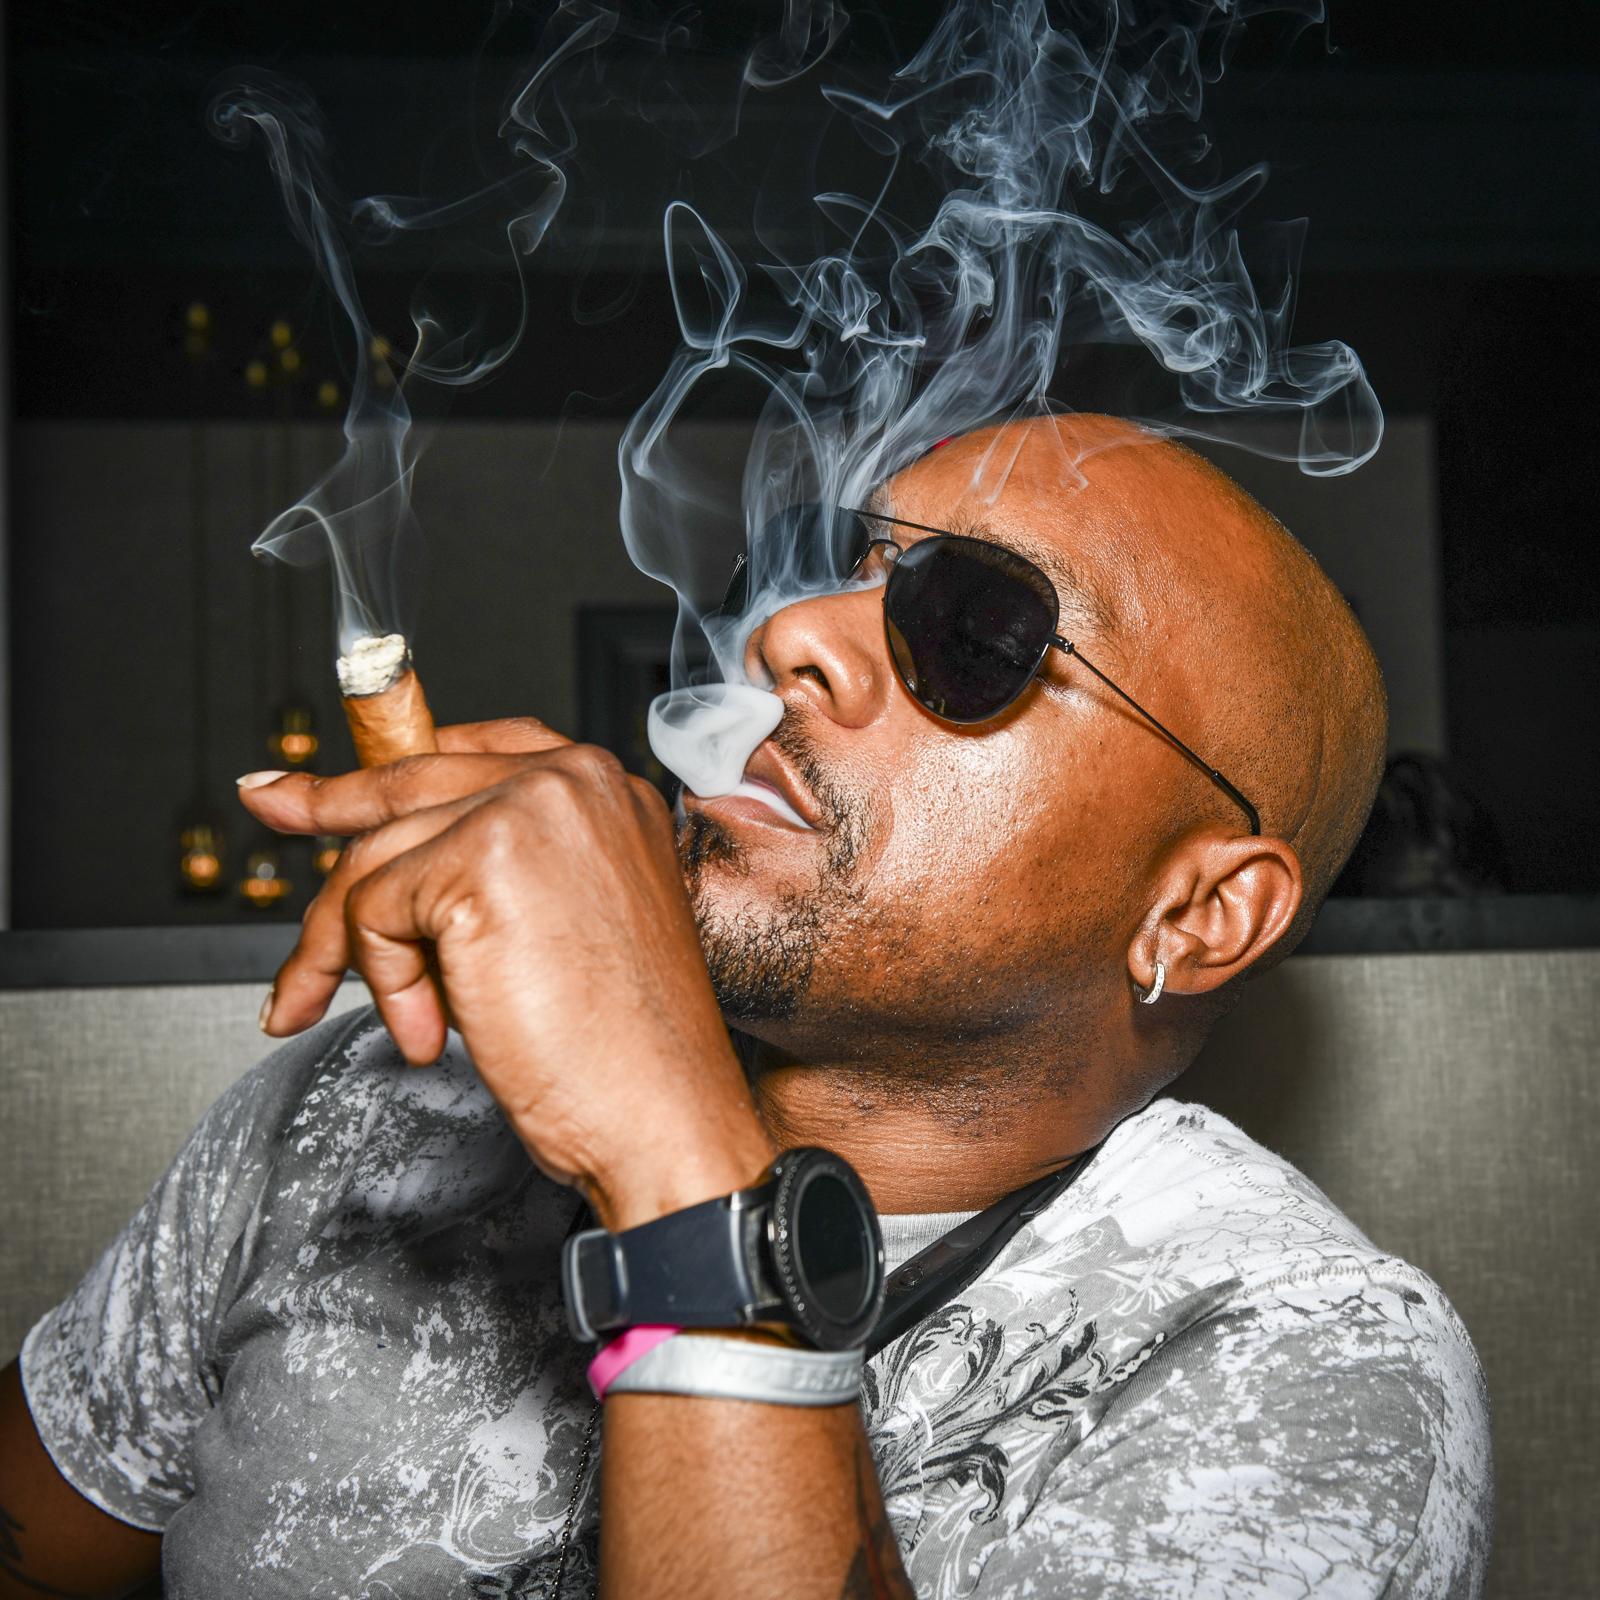 Burn-atlanta-cigar-8028.jpg